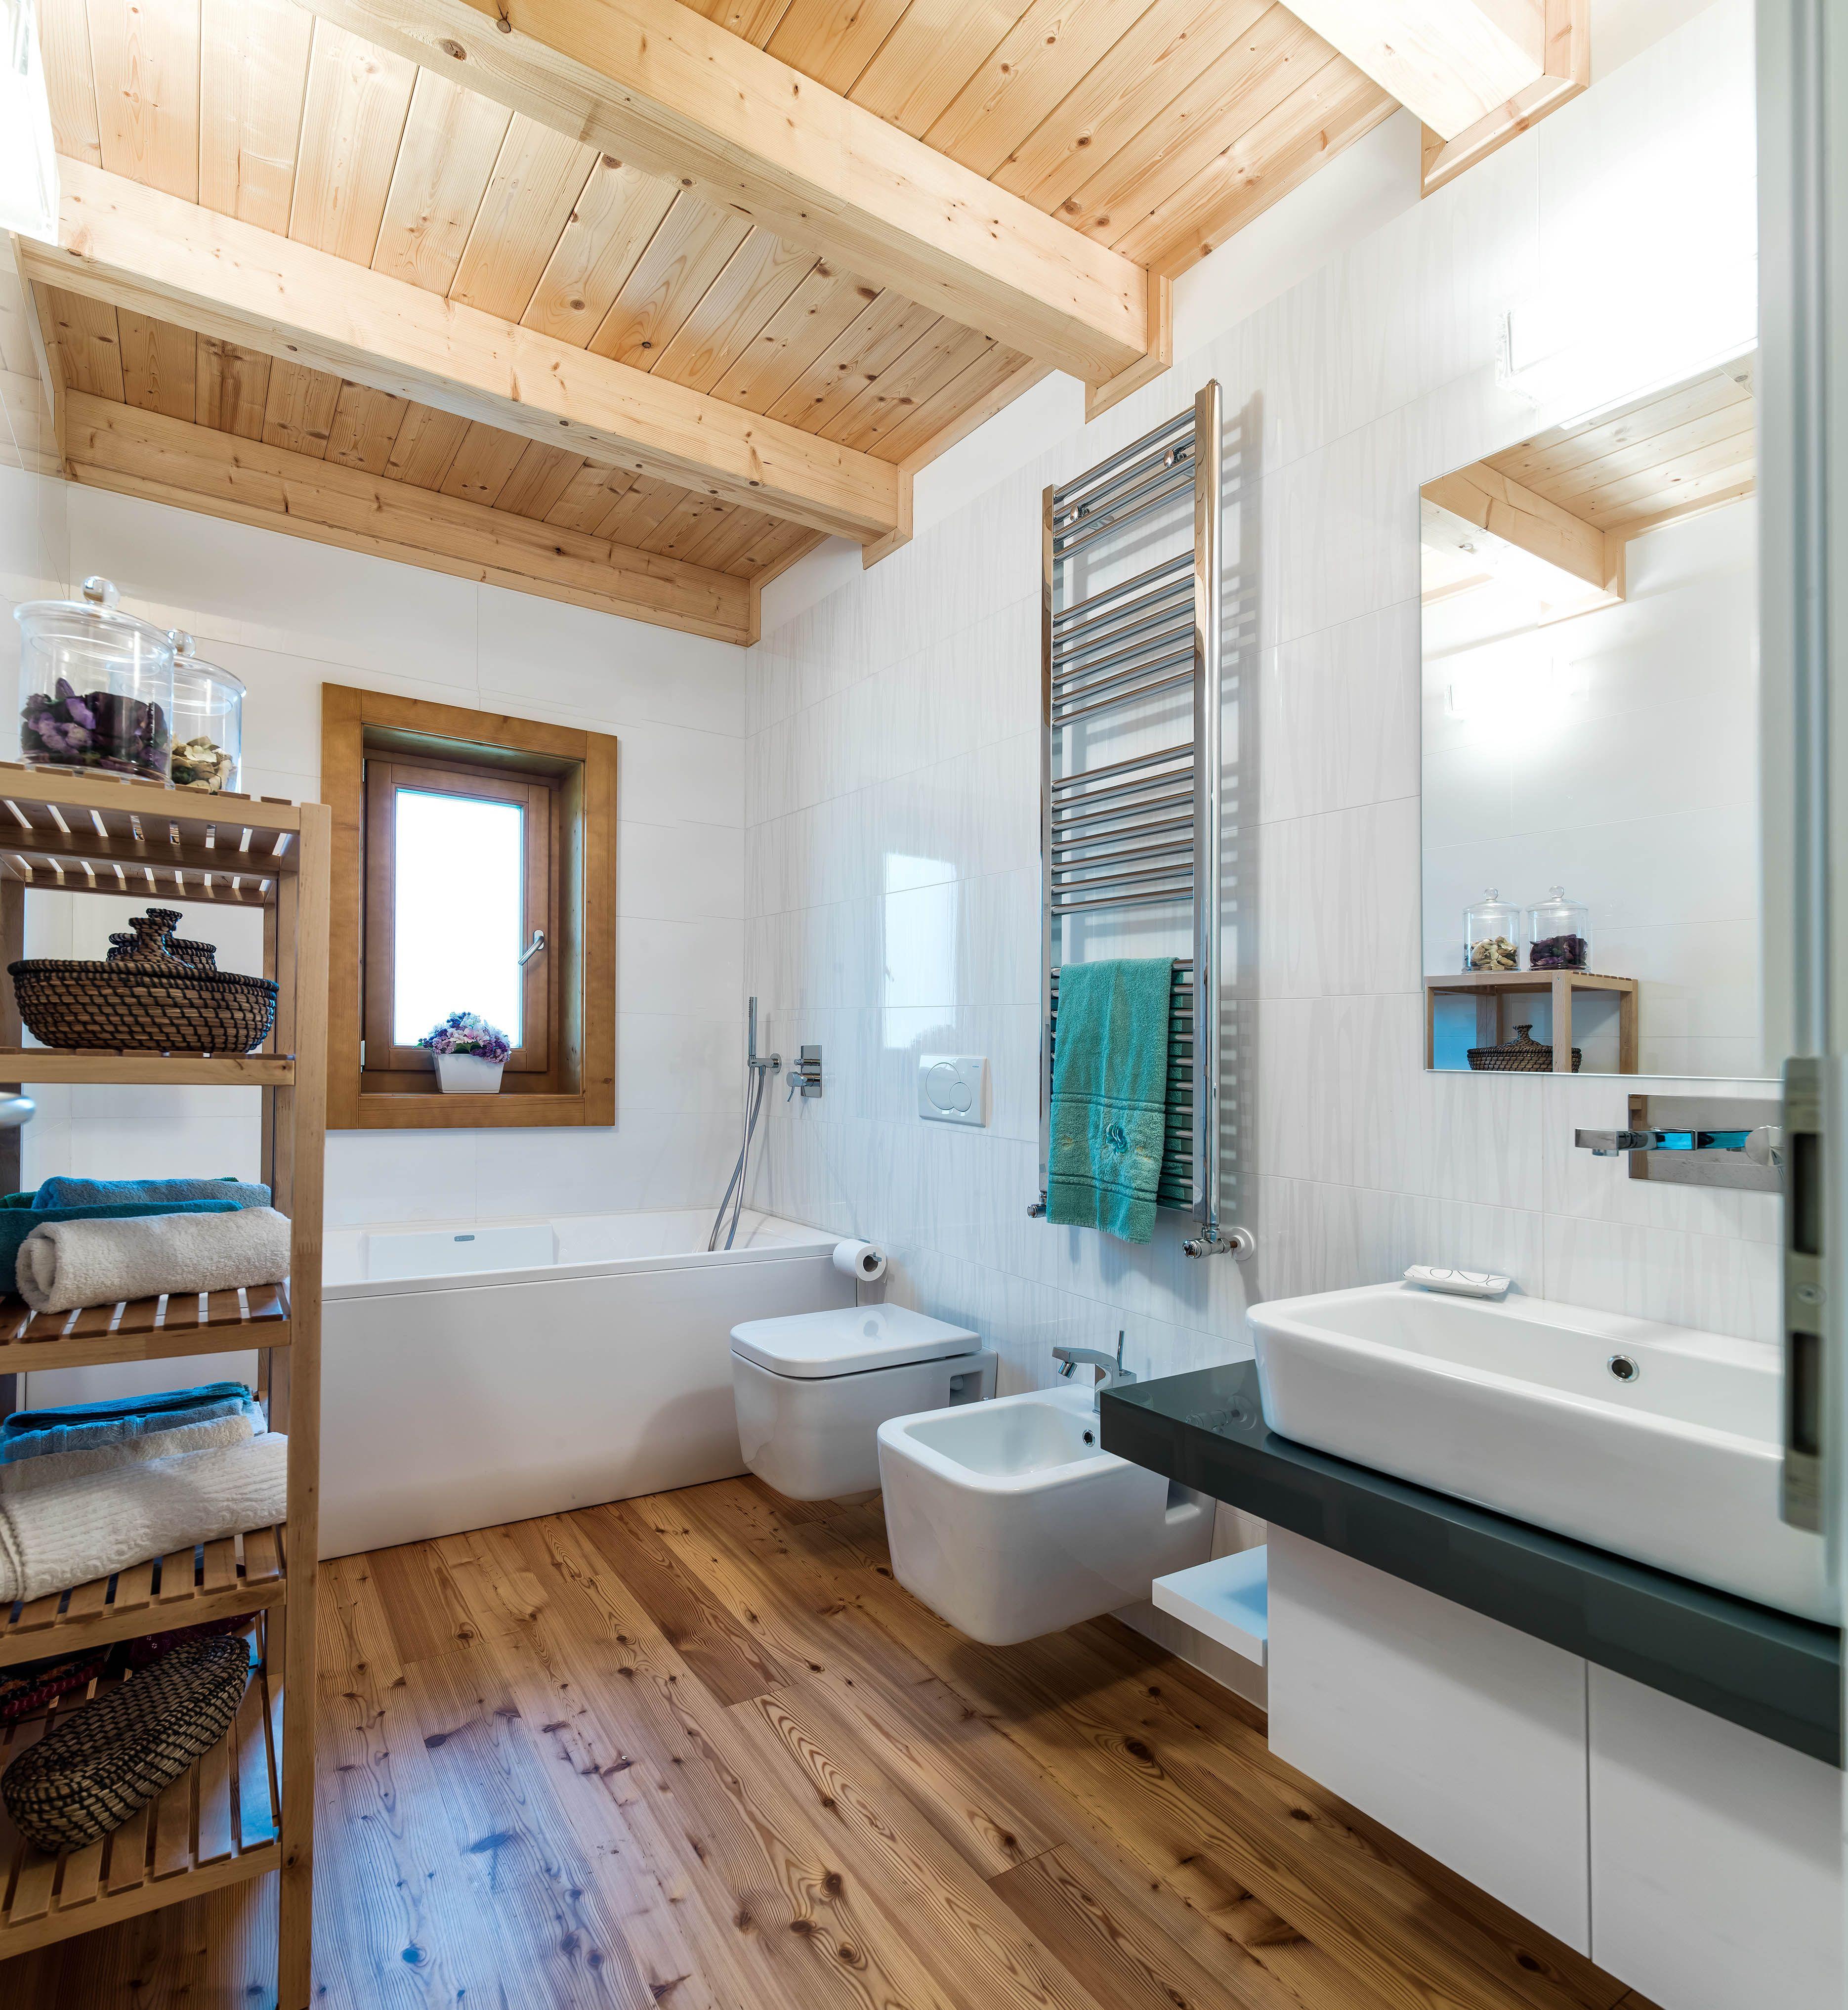 Architettura Rubner Haus | Casa Blockhaus Noci - Puglia | Pinterest ...